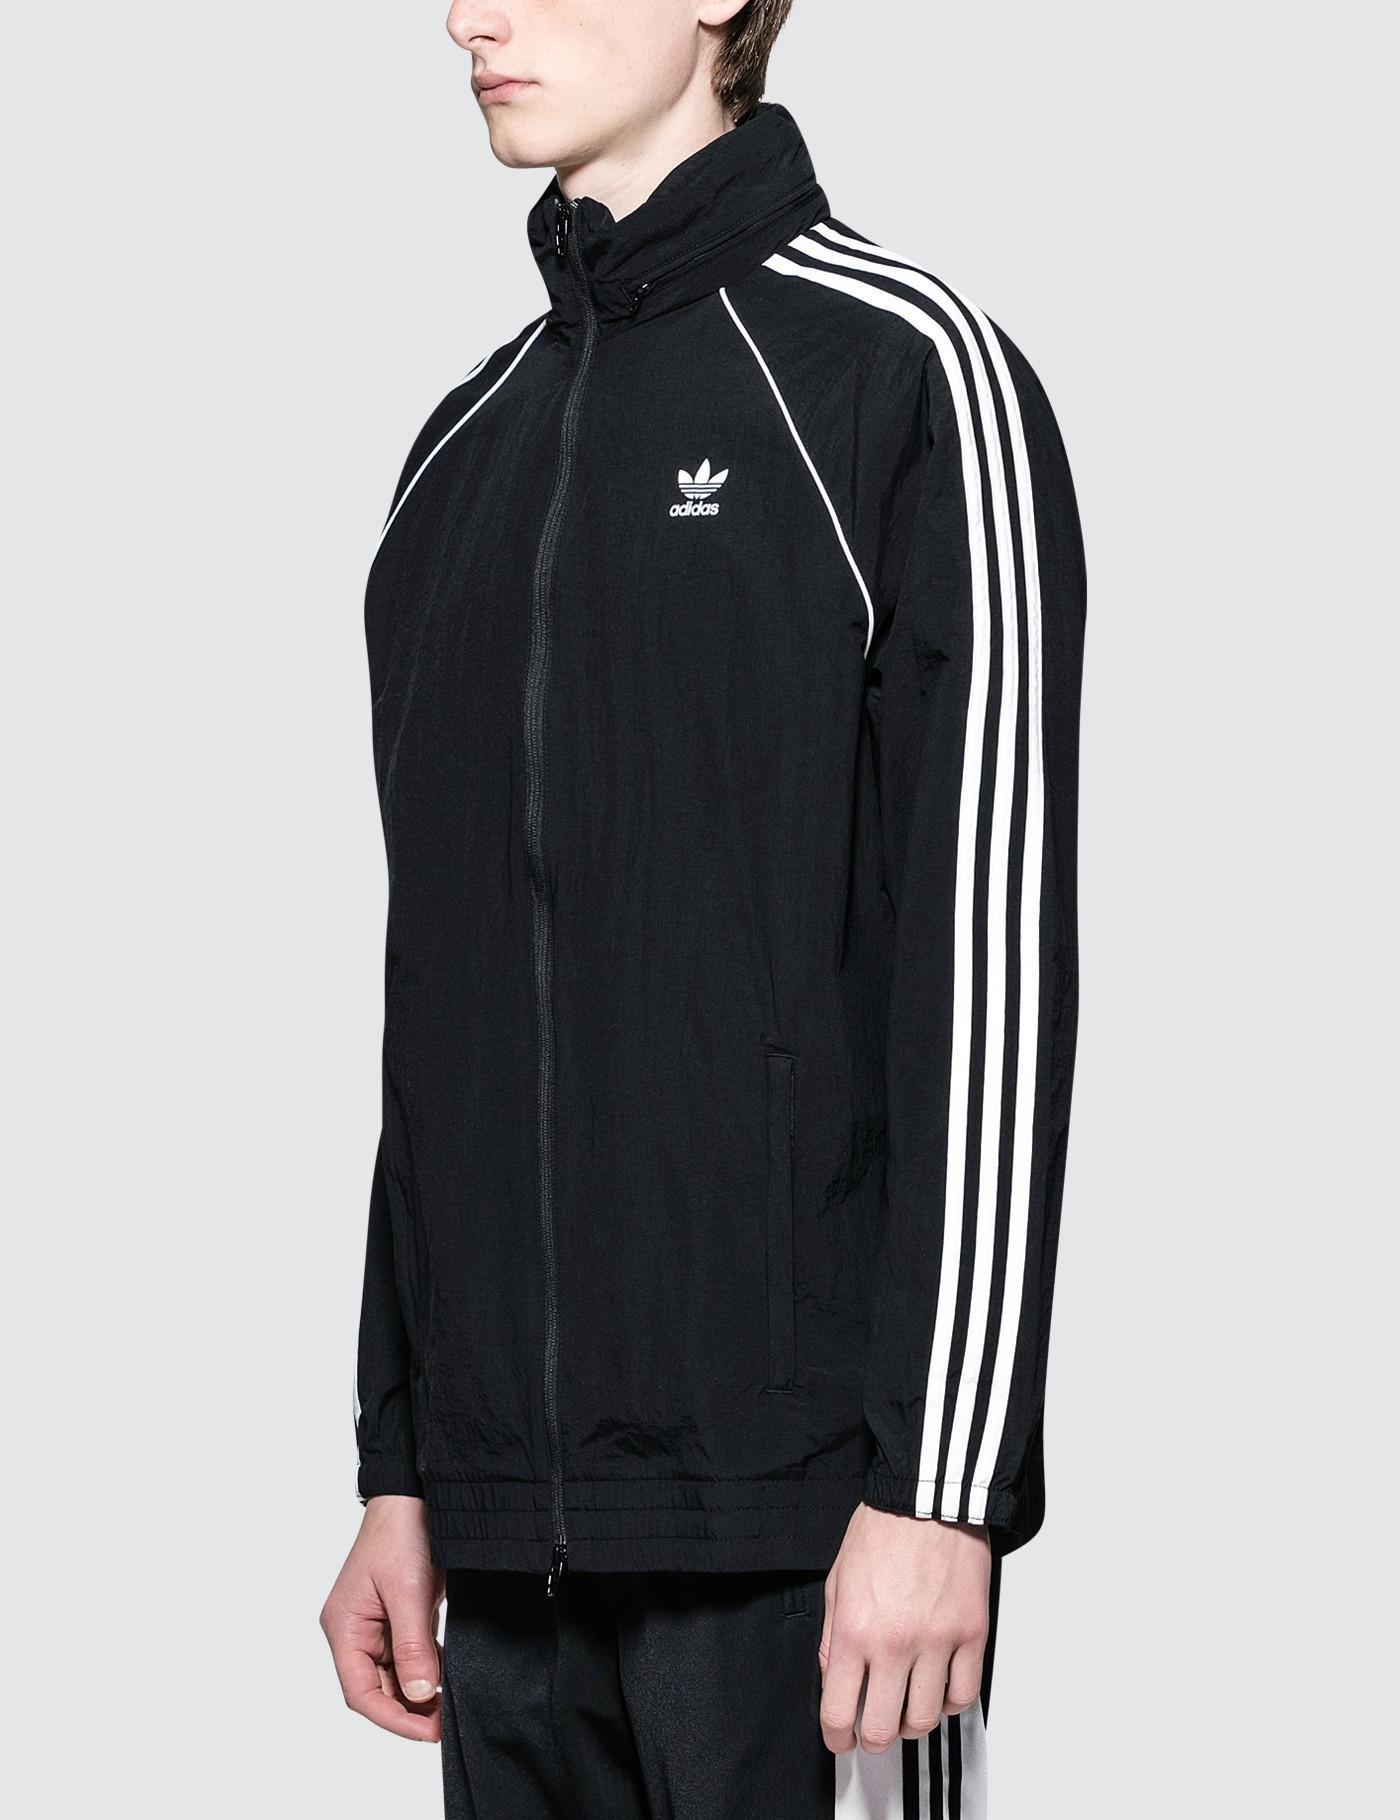 e41cefe2090e adidas Originals Sst Windbreaker Jacket - Mens S in Black for Men - Save  51% - Lyst